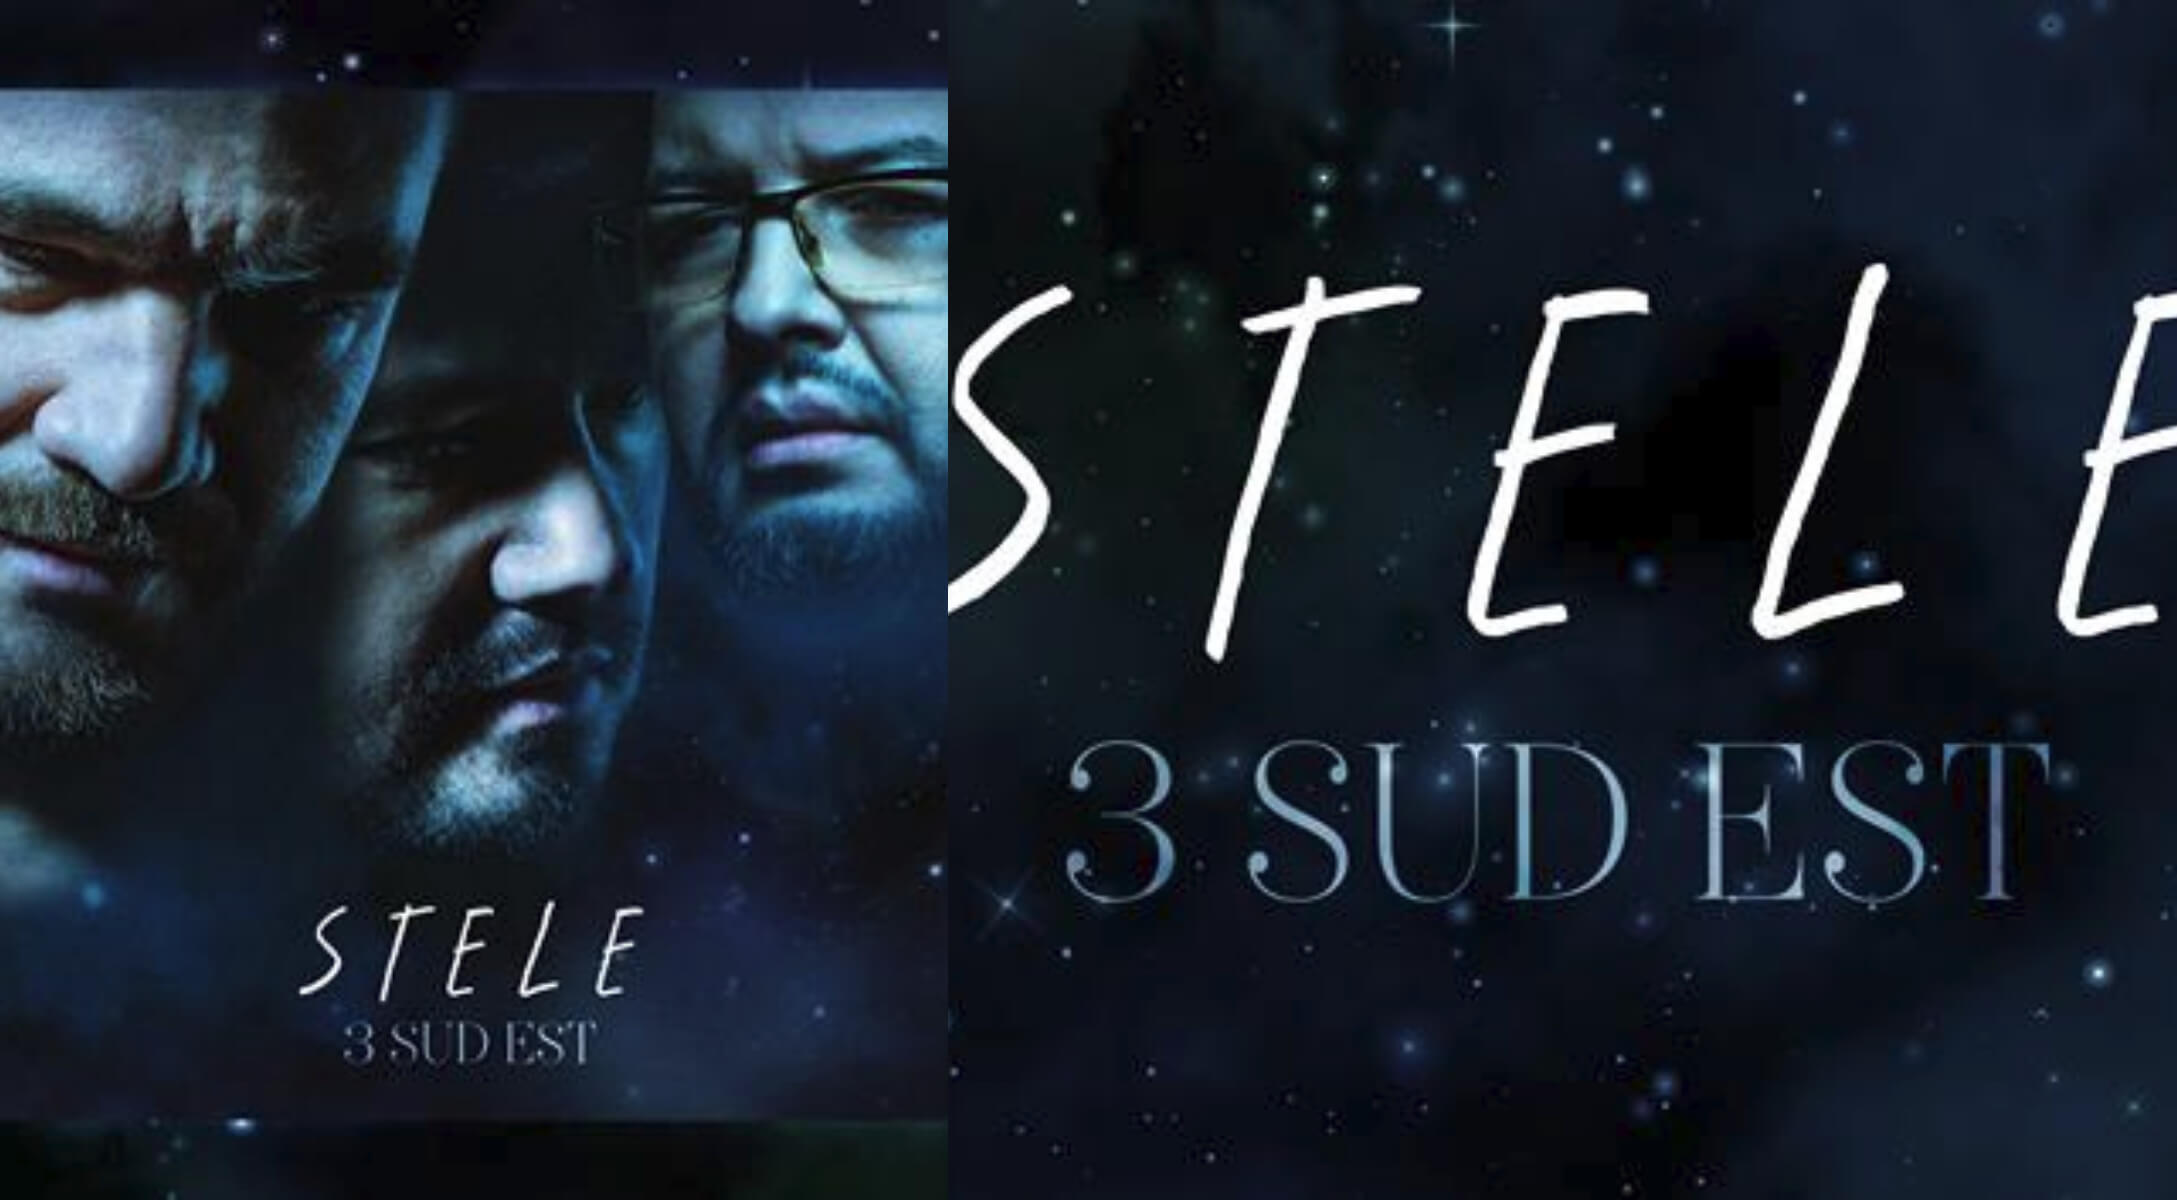 "NOU: Trupa 3 Sud Est a lansat videoclipul ,,Stele"" – VIDEO"